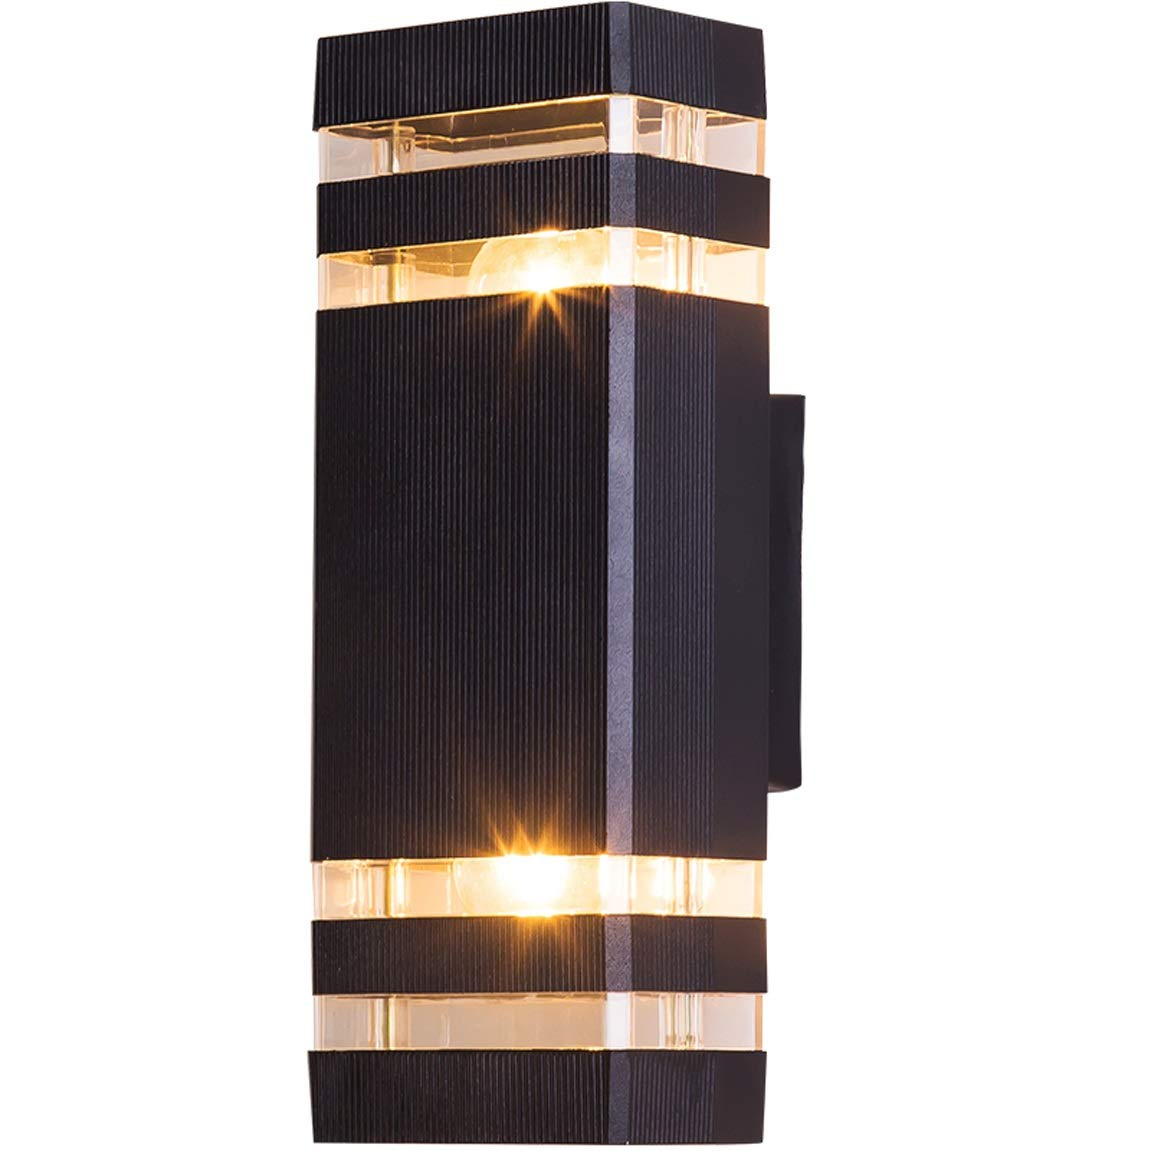 HZB Rechteckige Außenwandlampe, Wandlampe, moderner kreativer Gang, wasserdichte Außenwand-Lampe, Patio-Balkon-Wand-Lampe